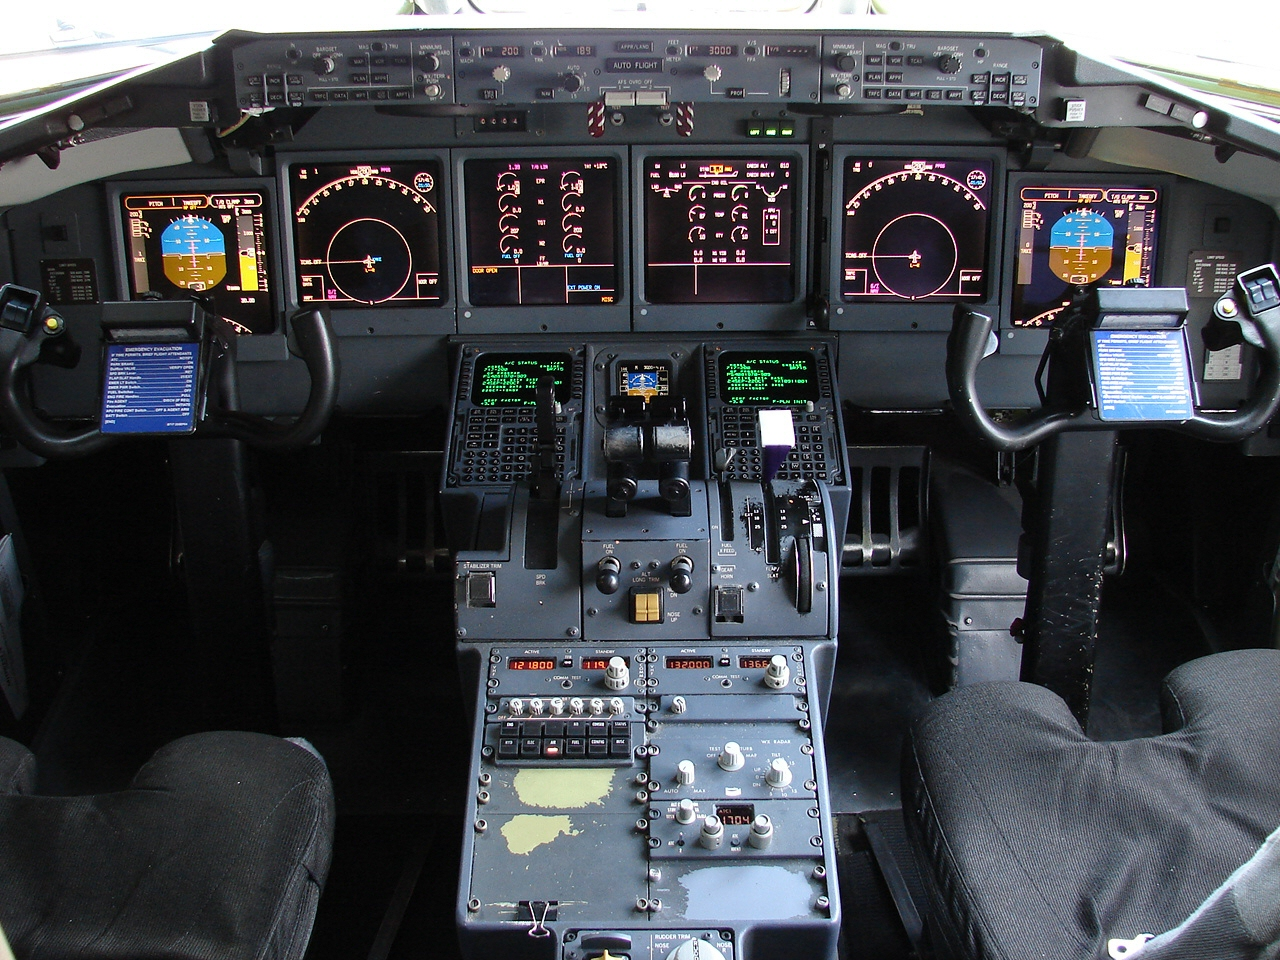 file cockpit of boeing 717 4044023759 jpg wikimedia commons